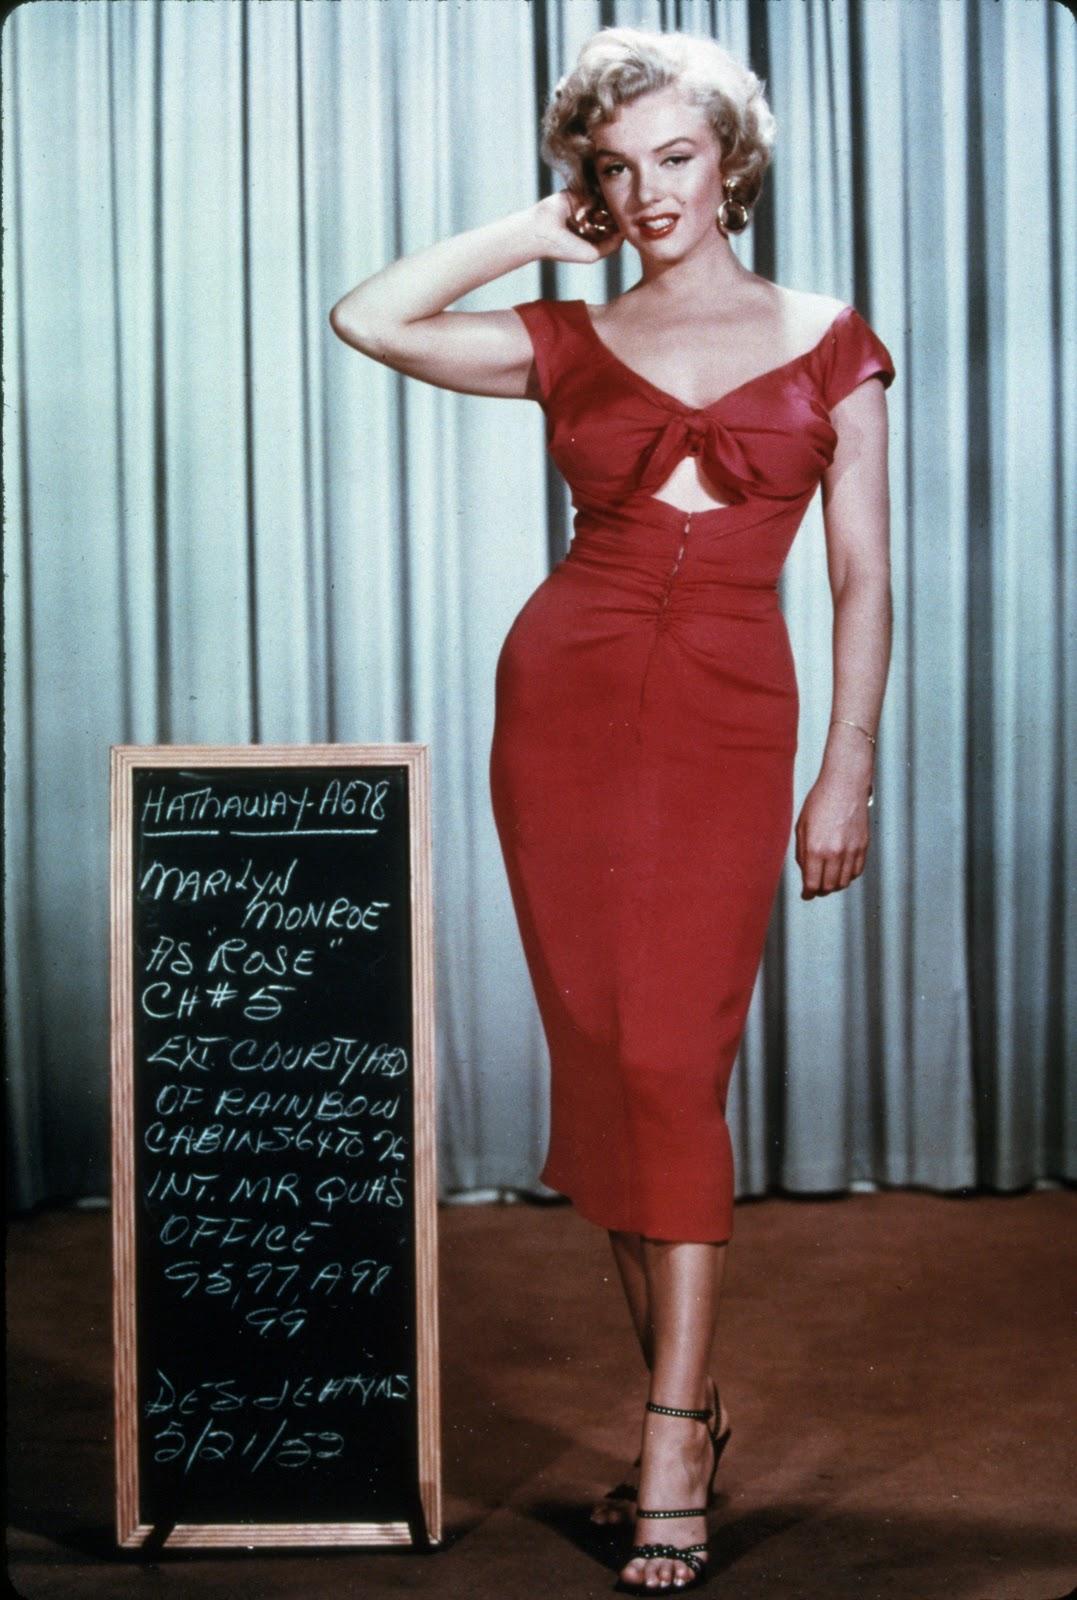 http://1.bp.blogspot.com/-ojJecE36EUQ/Ts-LJ2Mw11I/AAAAAAAABro/SHp9wjypZlw/s1600/Marilyn-Monroe-704.jpg